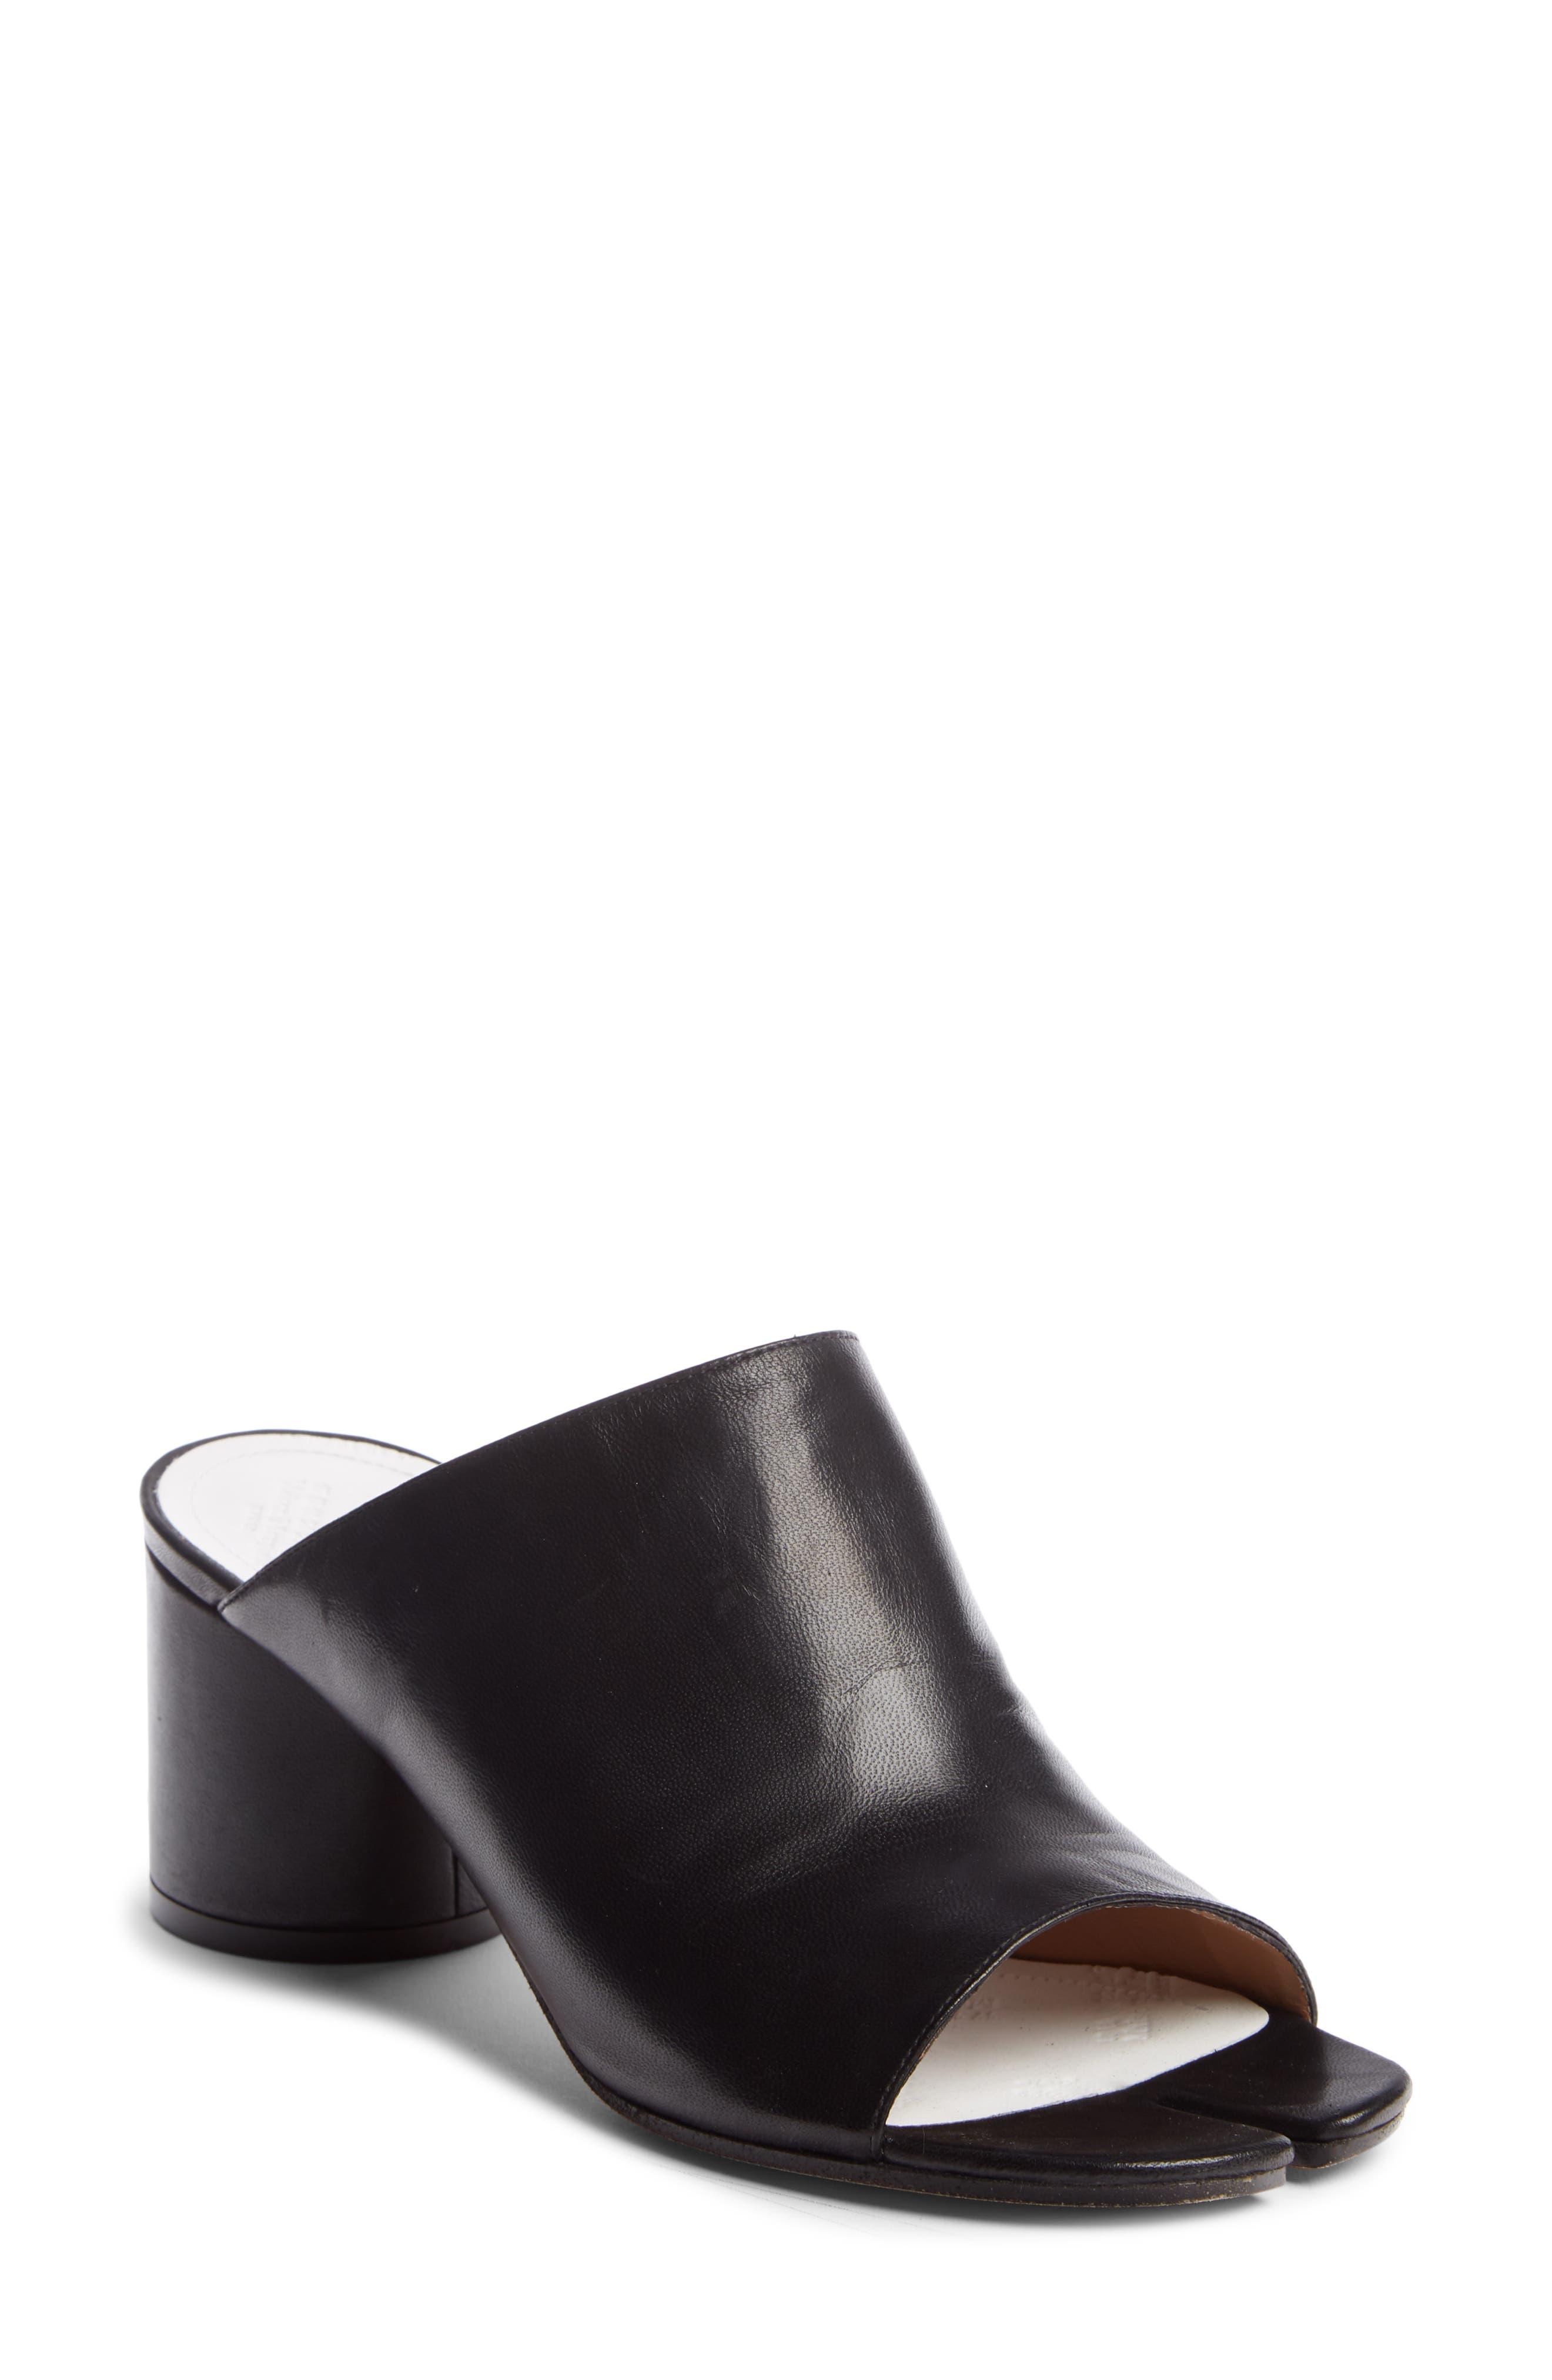 Women's Designer Mules \u0026 Slides   Nordstrom